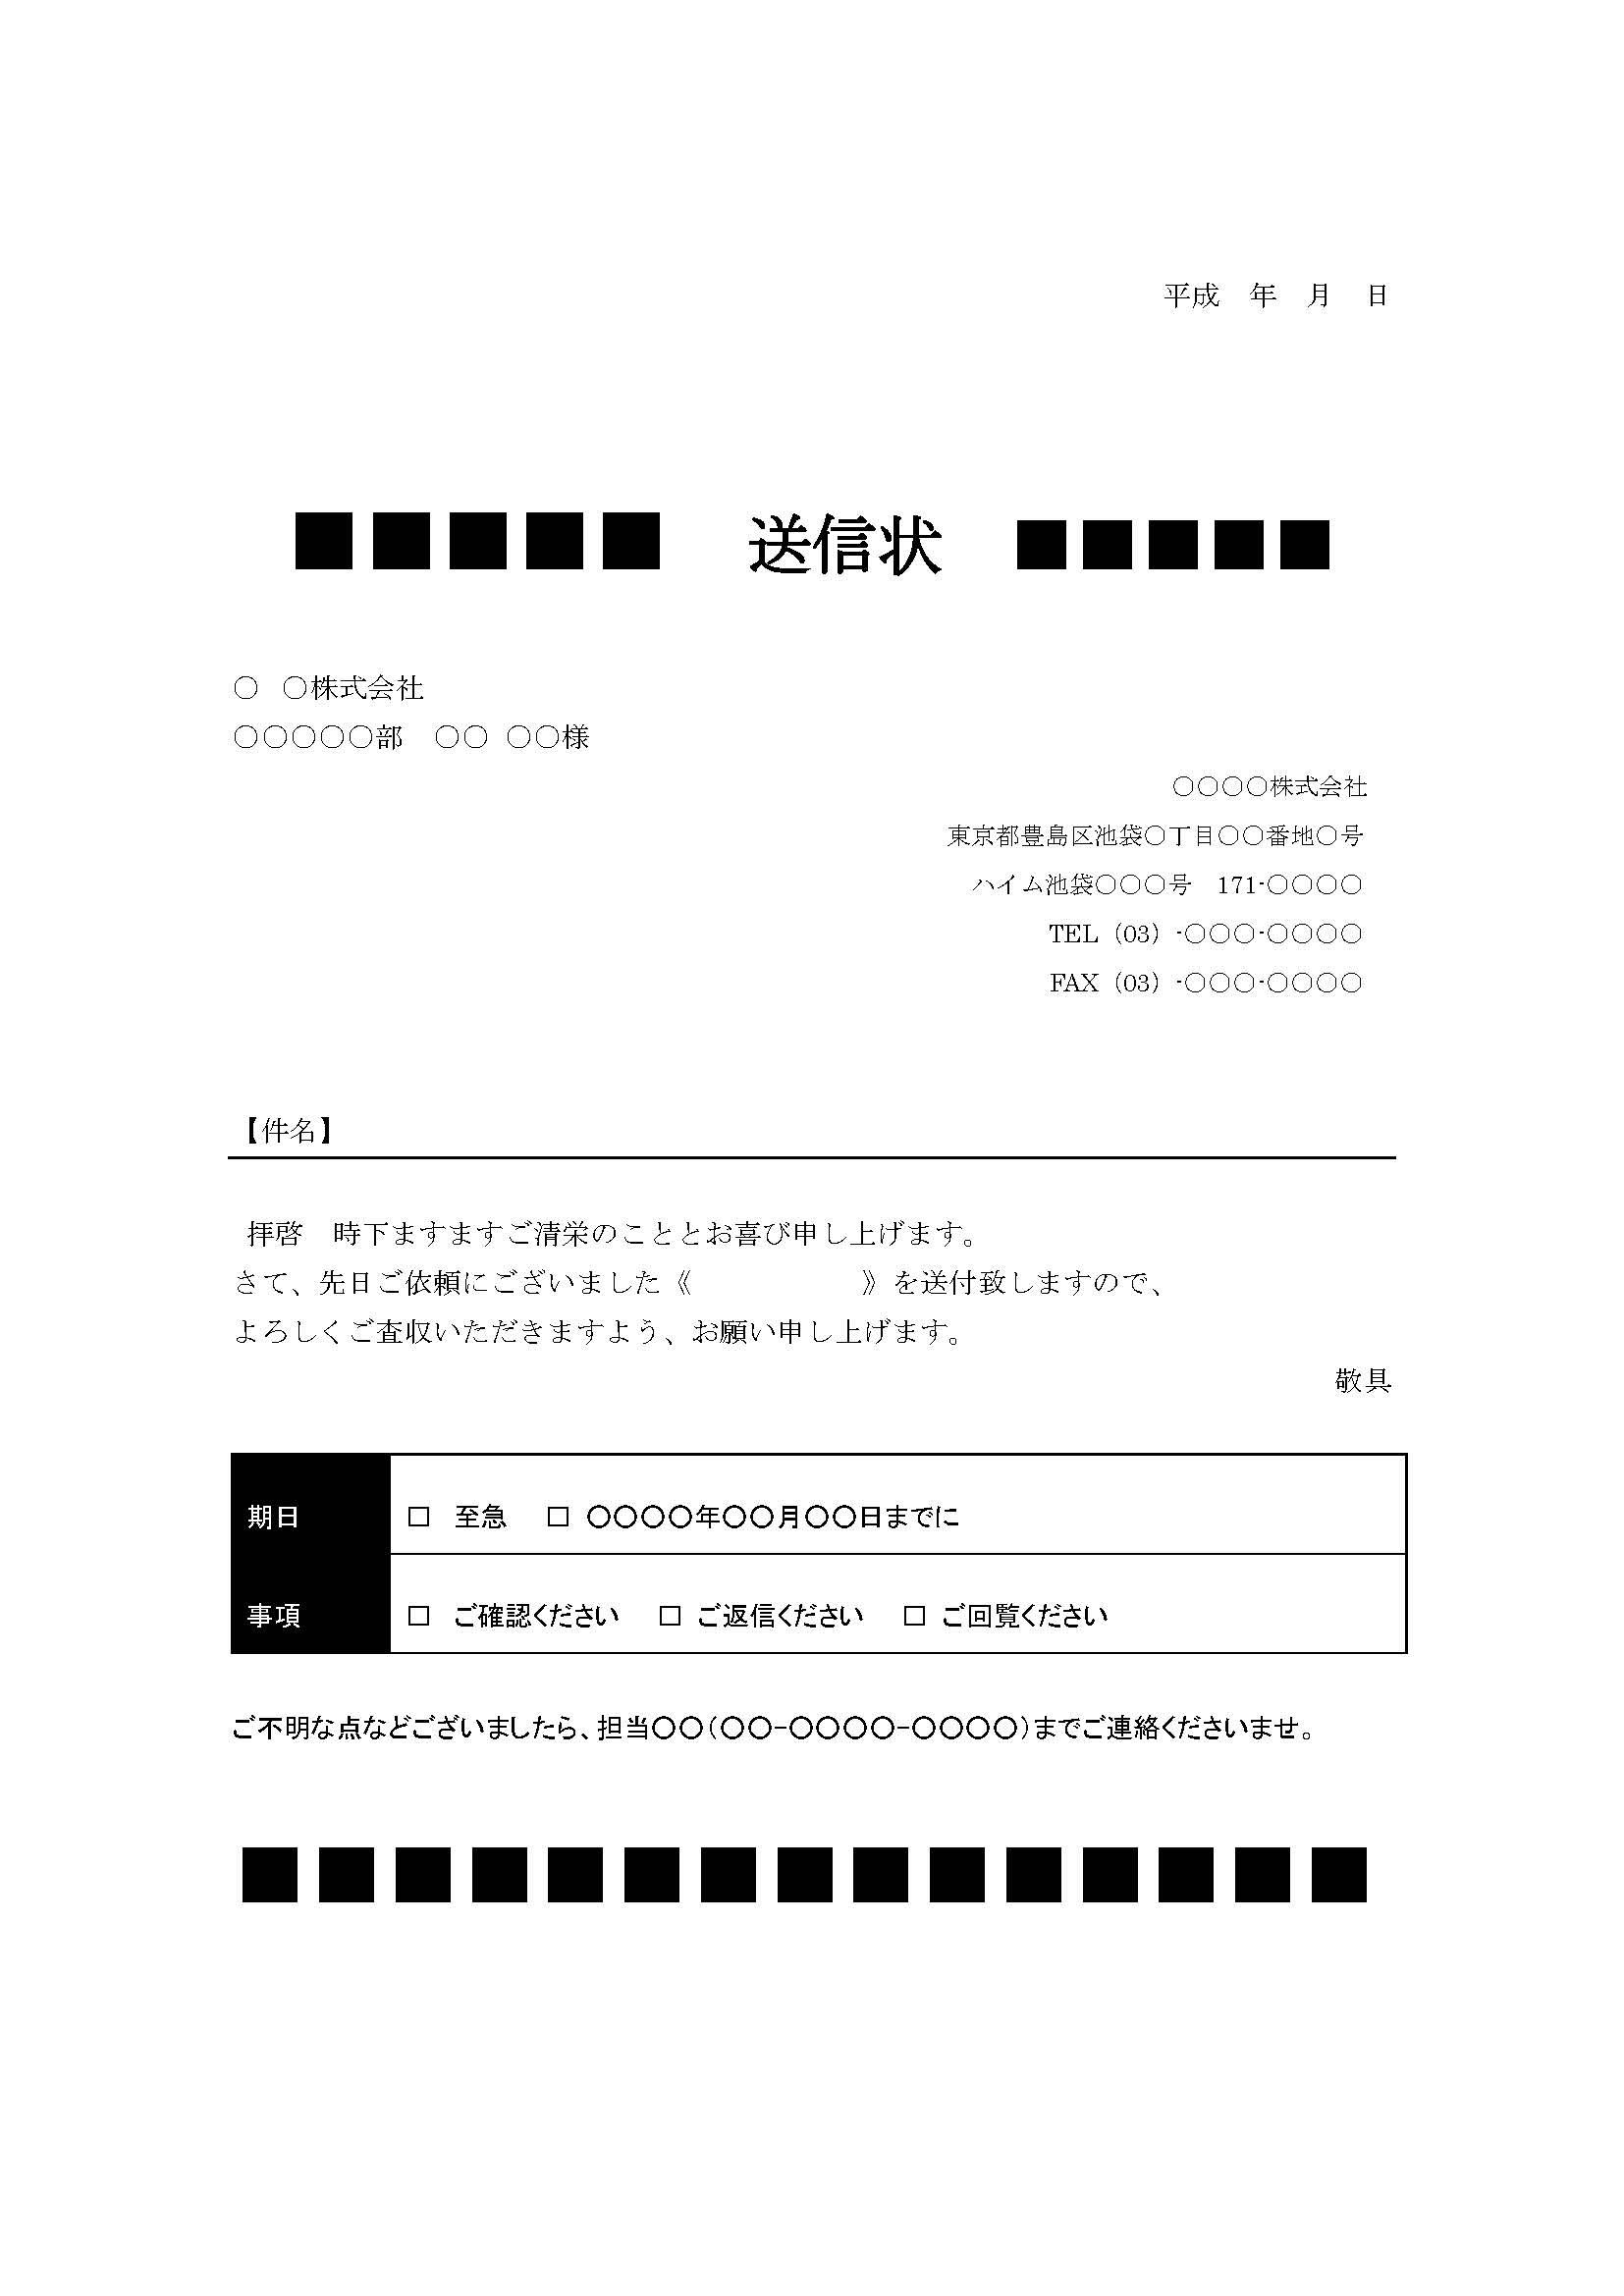 fax送信状_8